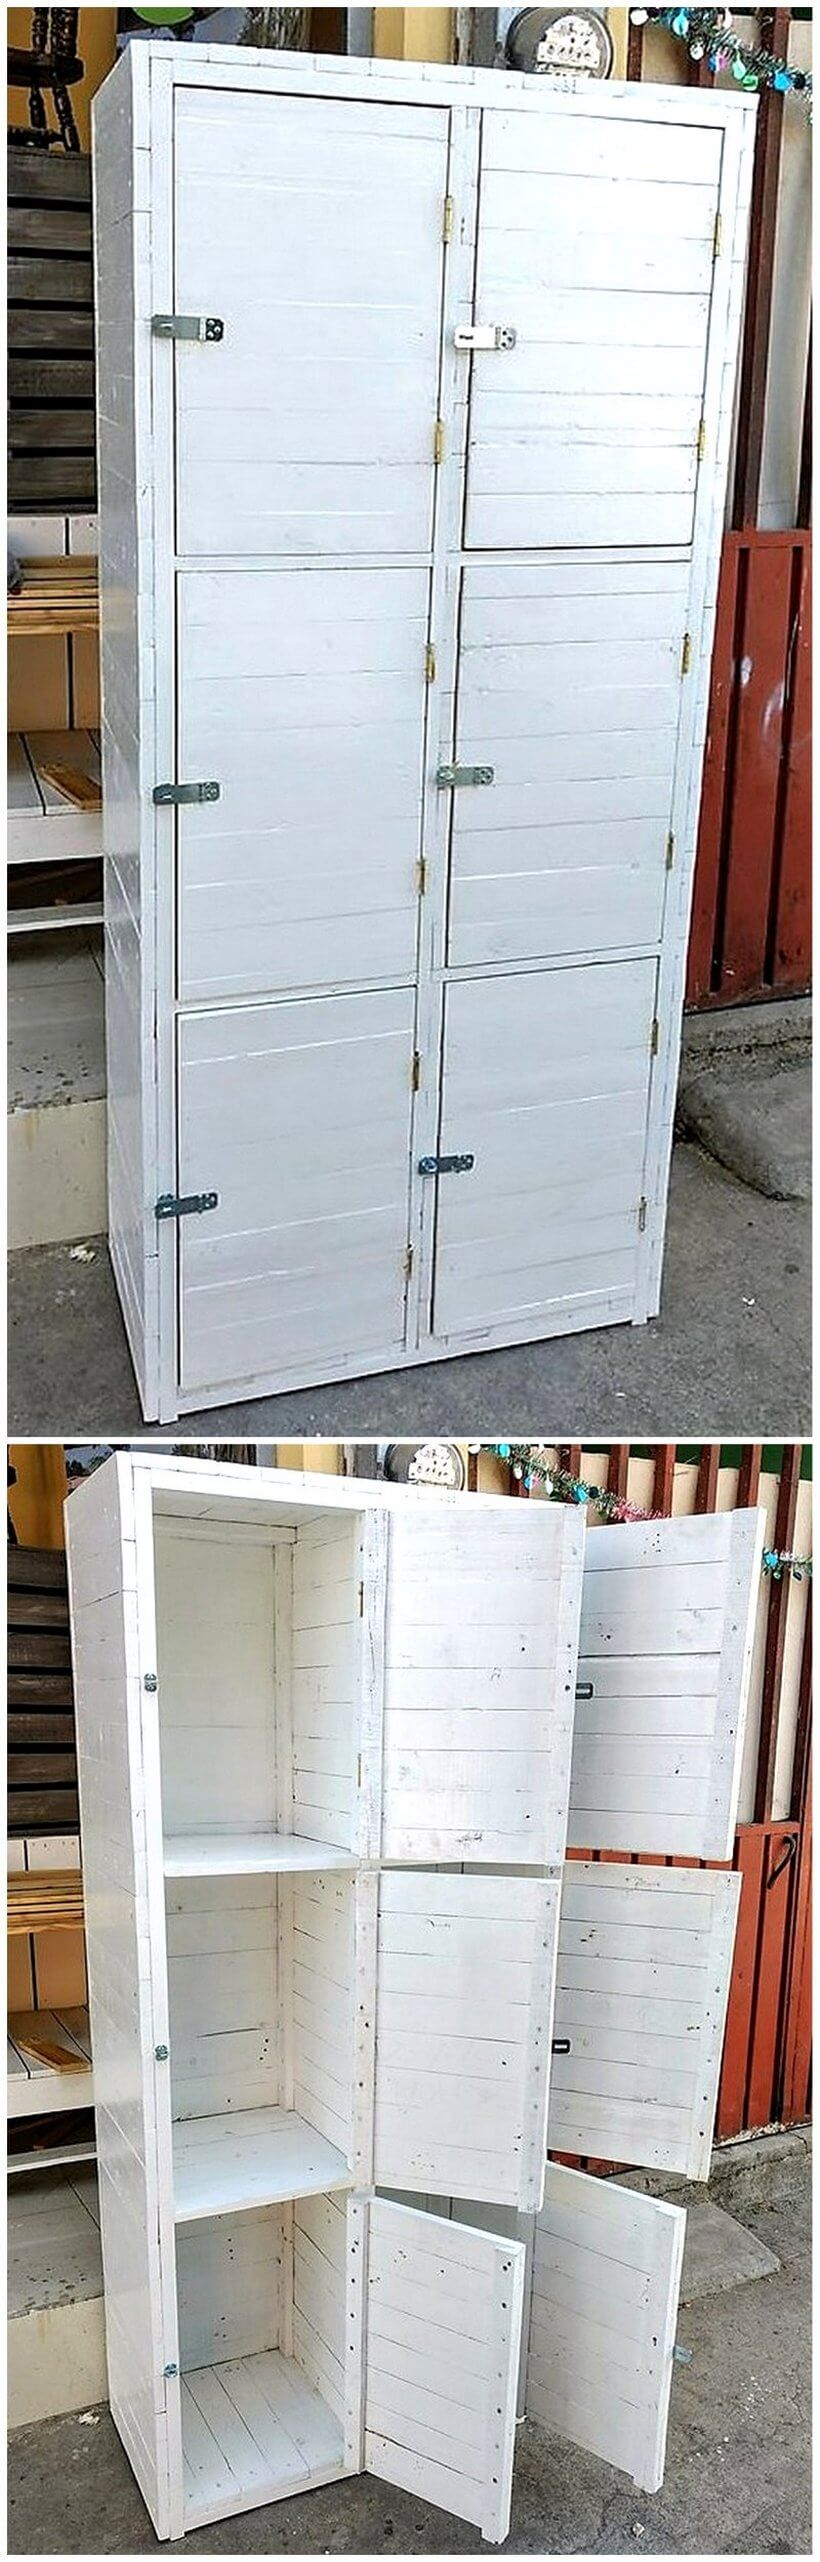 wooden pallets closet idea